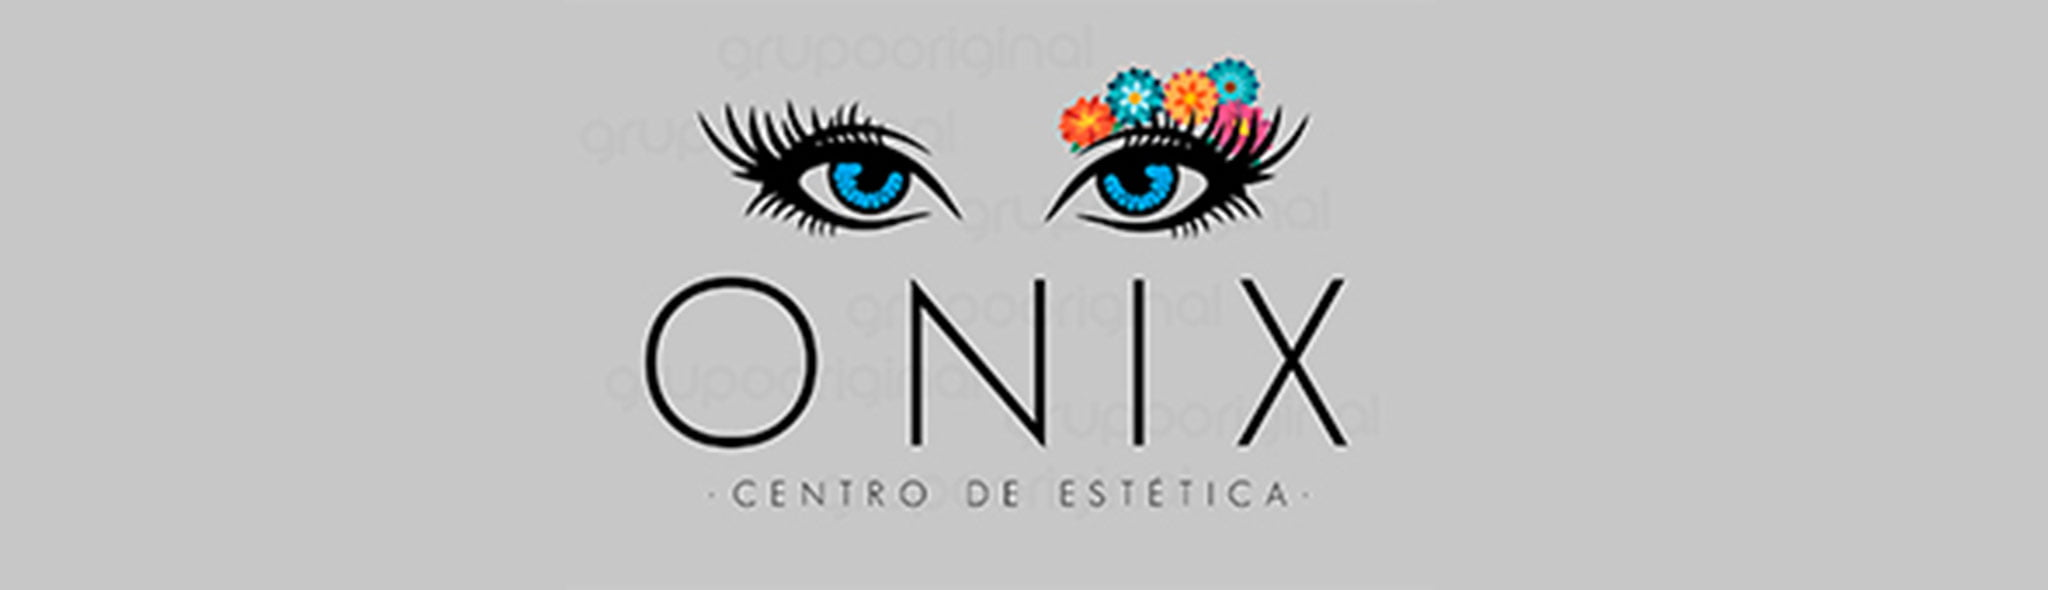 Logotipo de Centro de Estética ONIX